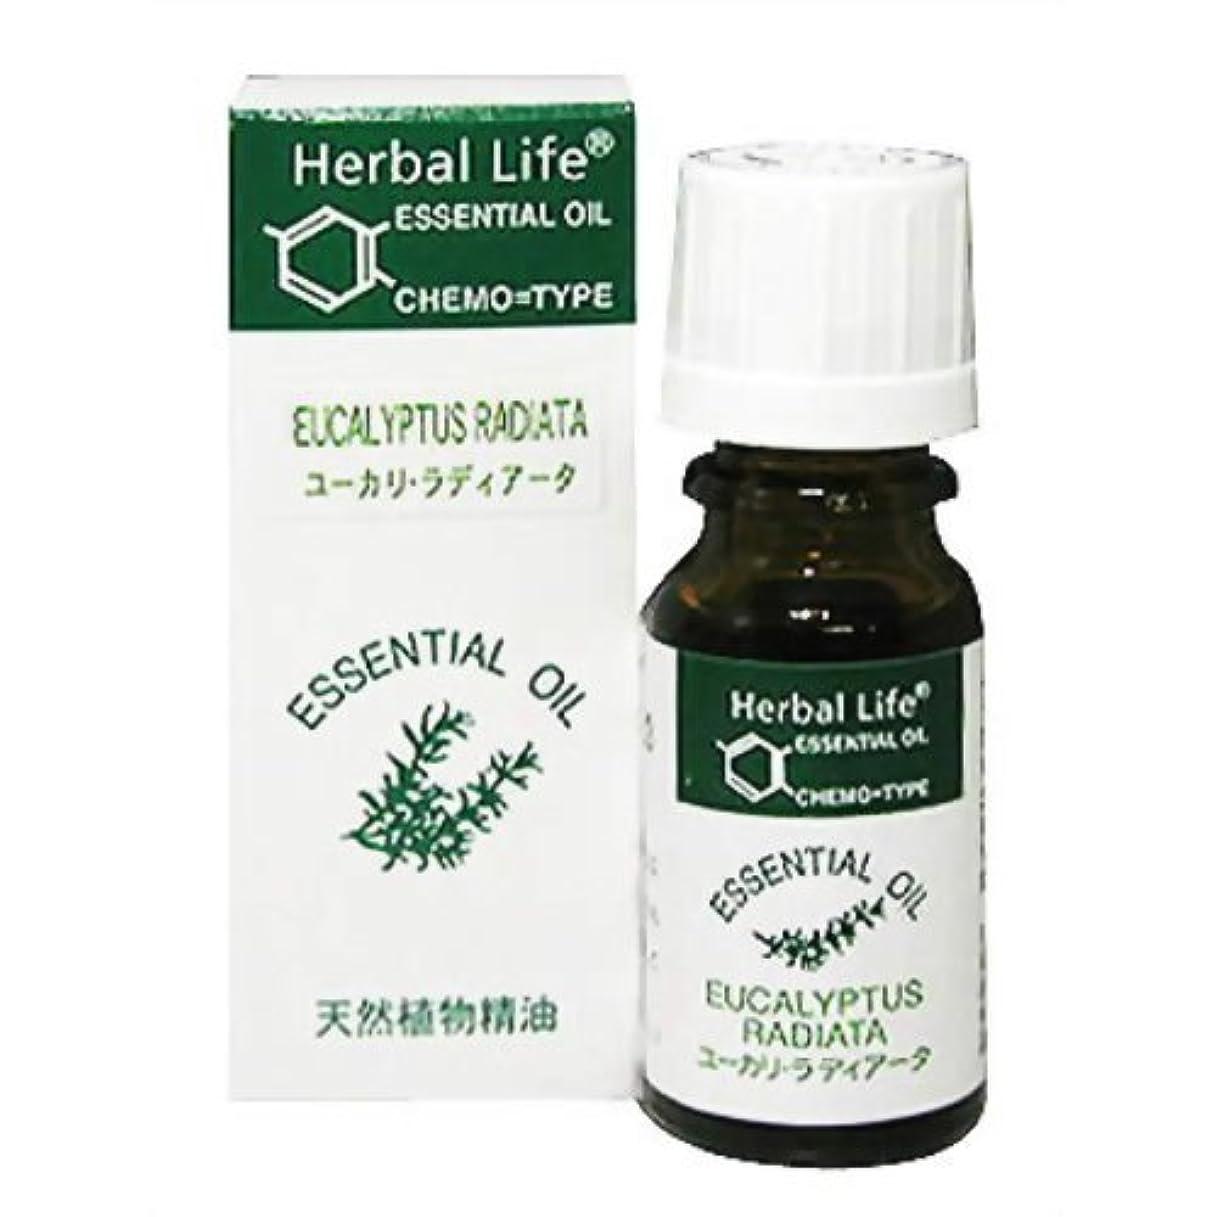 Herbal Life ユーカリ?ラディアータ 10ml